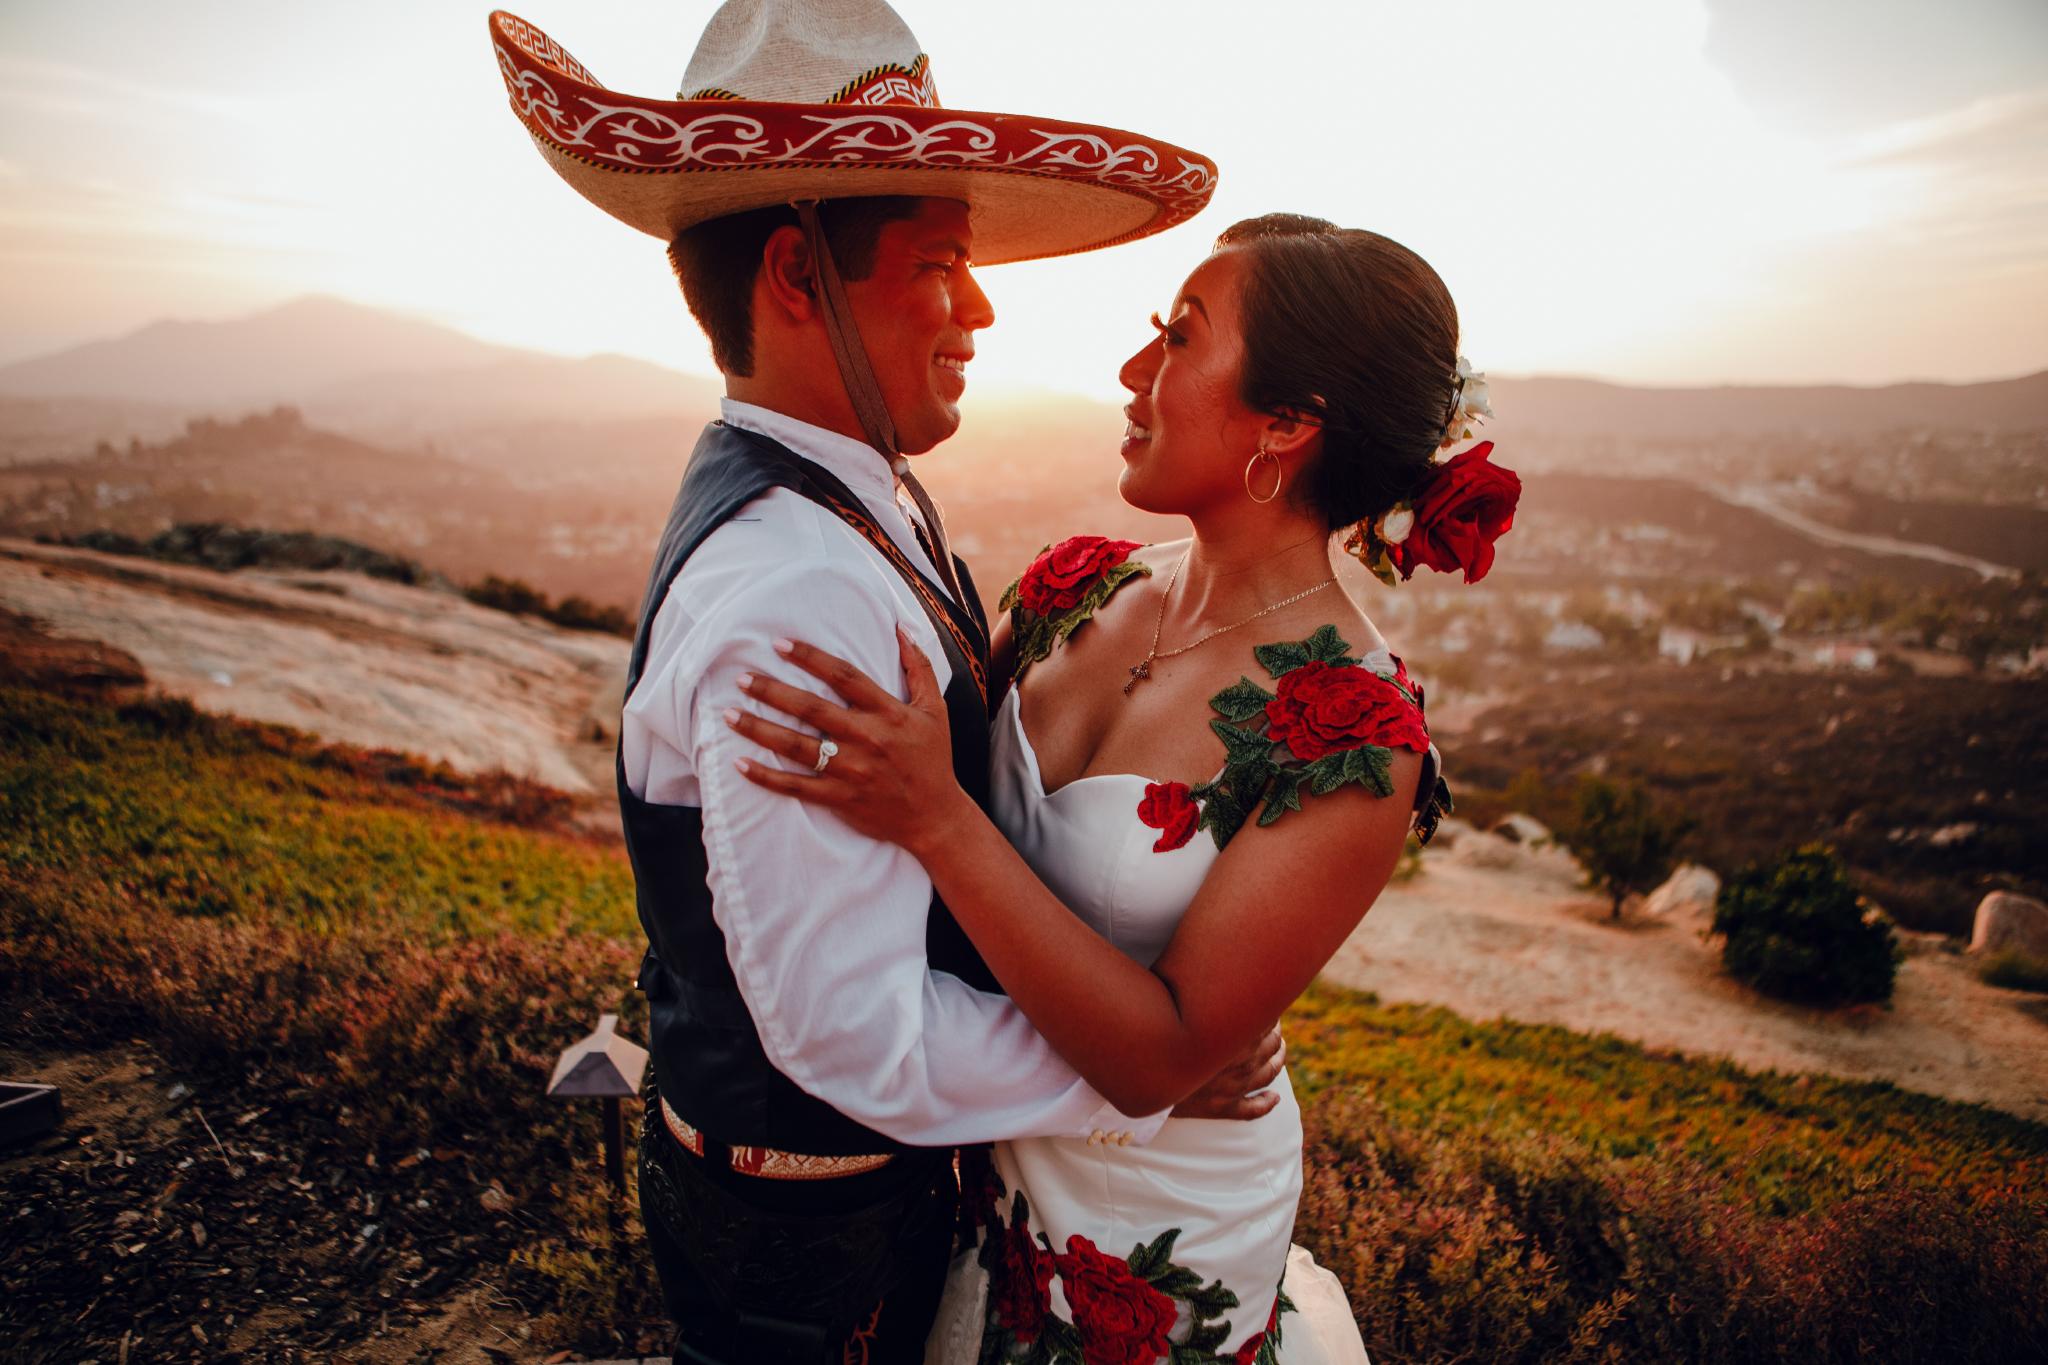 San Diego Wedding Photographer | couple posing during sunset at Montana cielo